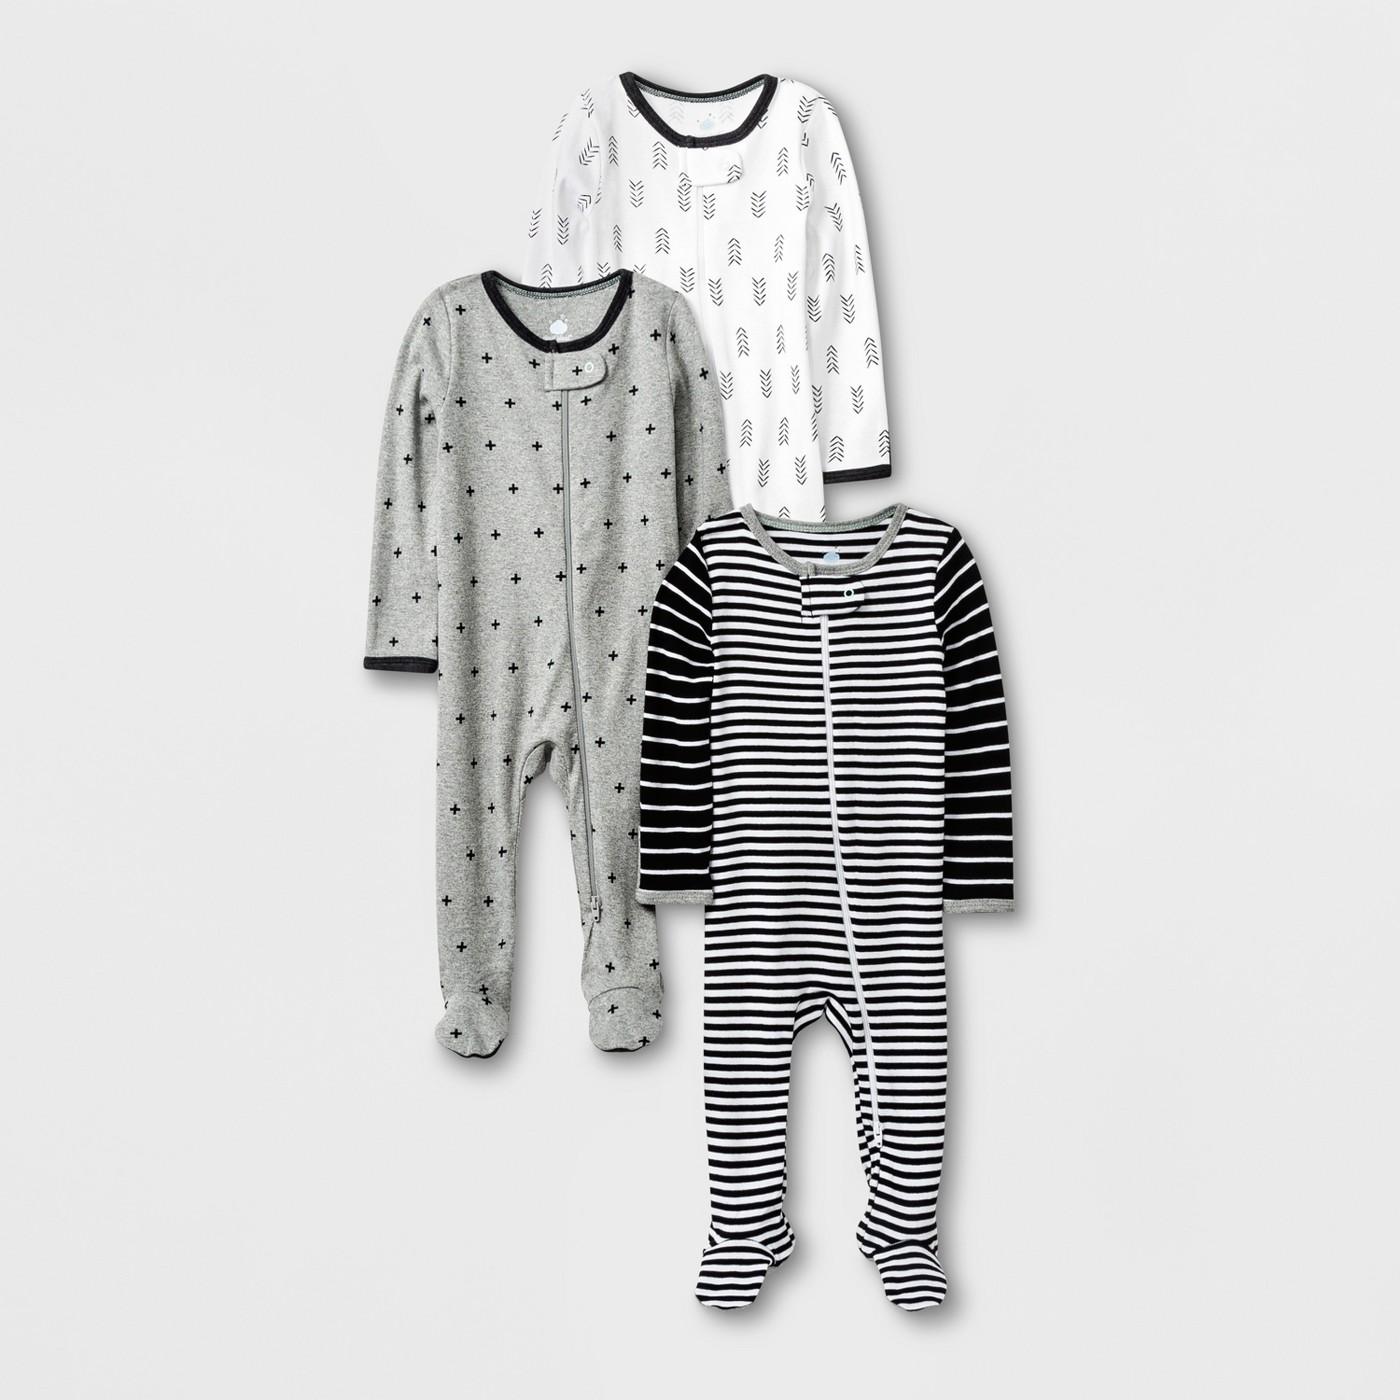 Baby 3pk Long Sleeve Footed Sleeper Set - Cloud Island™ Black/White/Gray - image 1 of 1